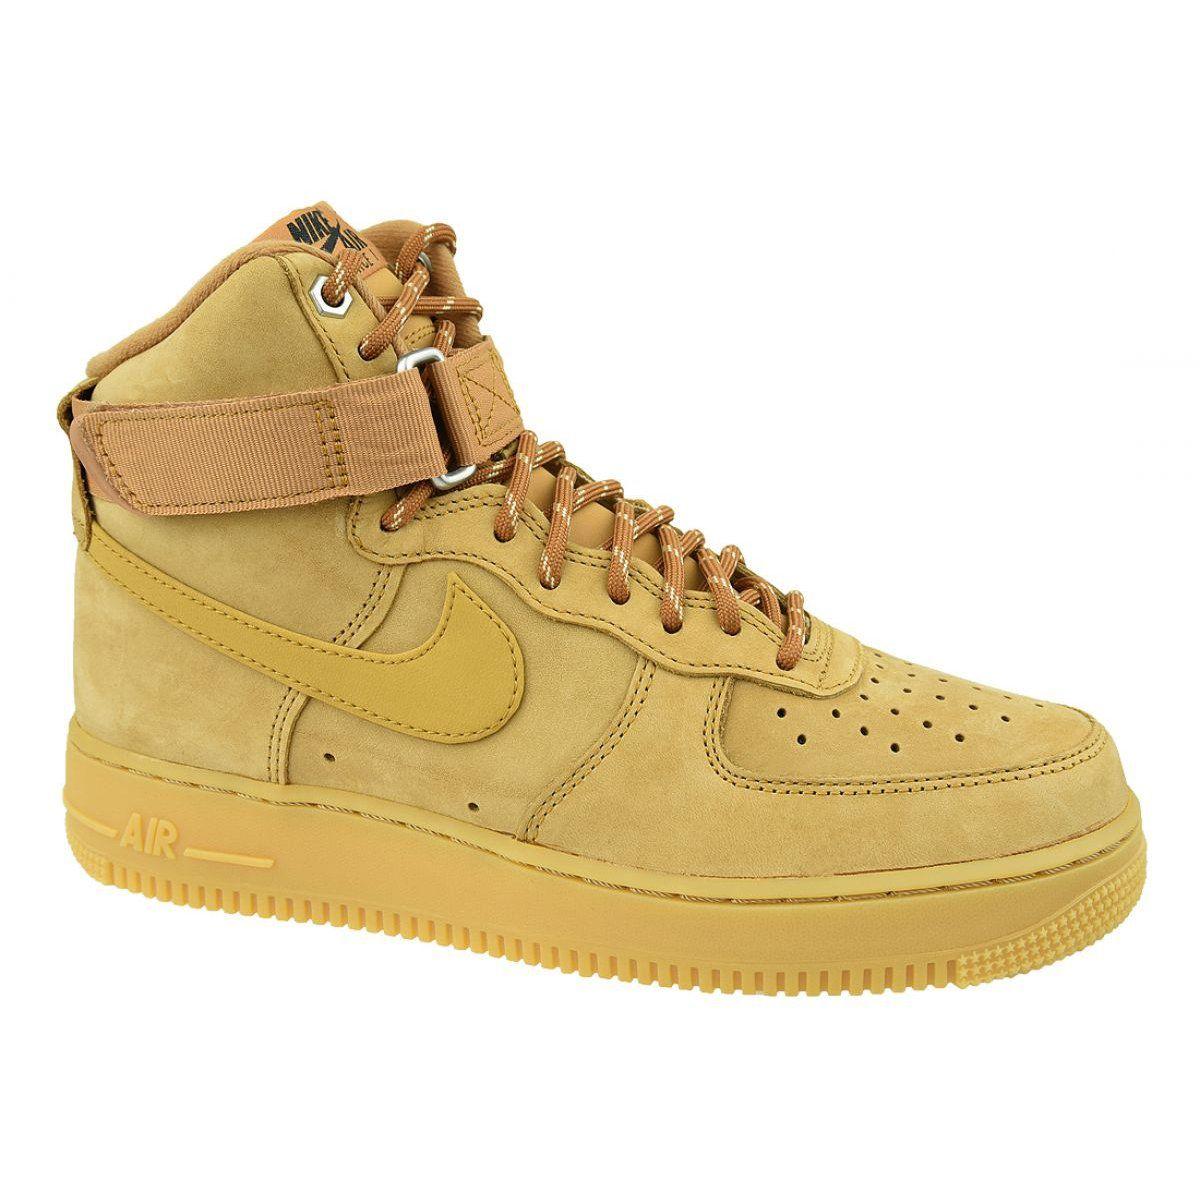 Buty Nike Air Force 1 High 07 Wb M Cj9178 200 Bezowy Wielokolorowe Nike Air Force Nike Air Nike